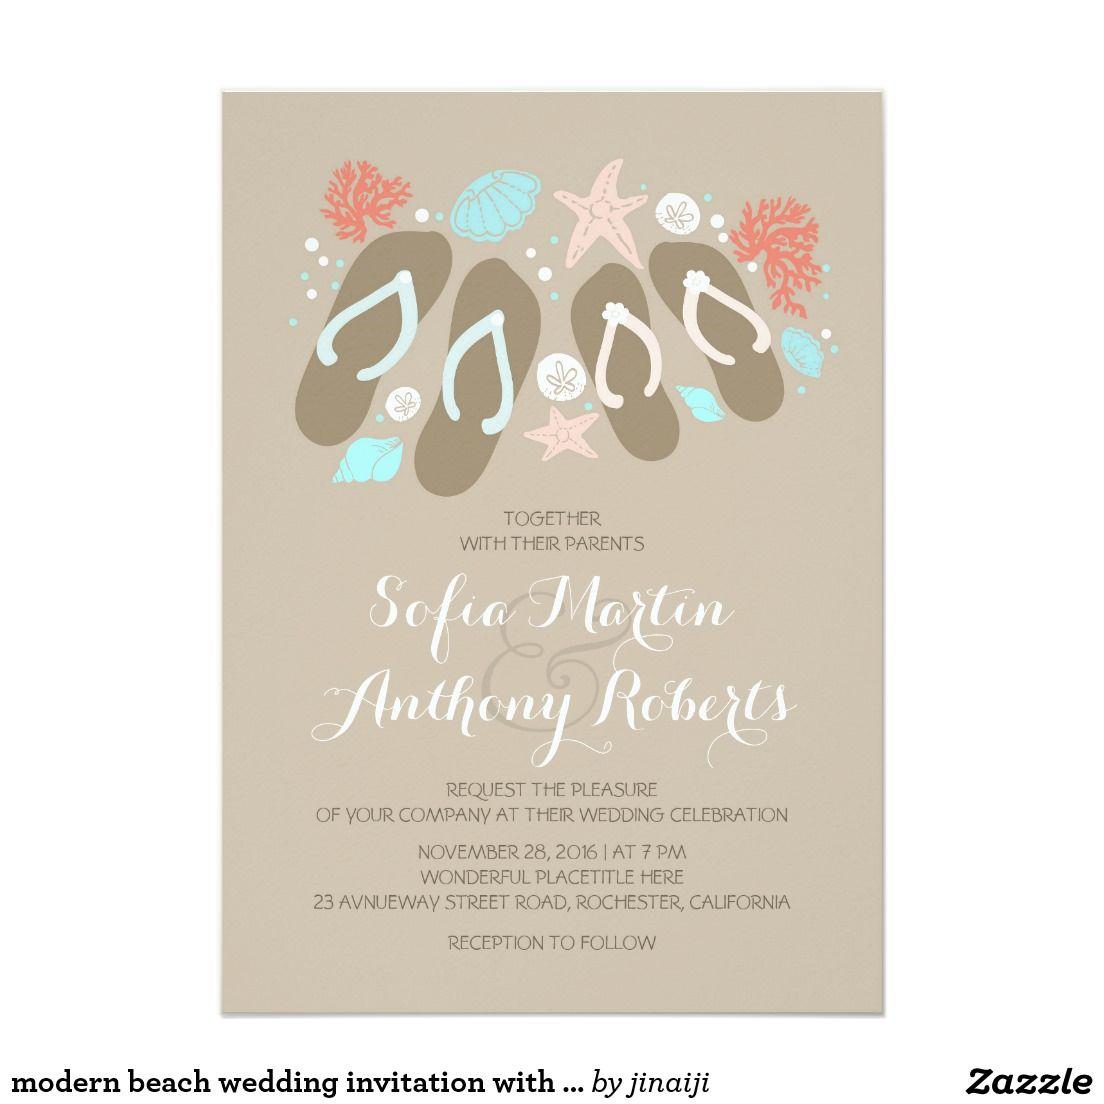 Modern beach wedding invitation with flip flops | Pinterest | Beach ...